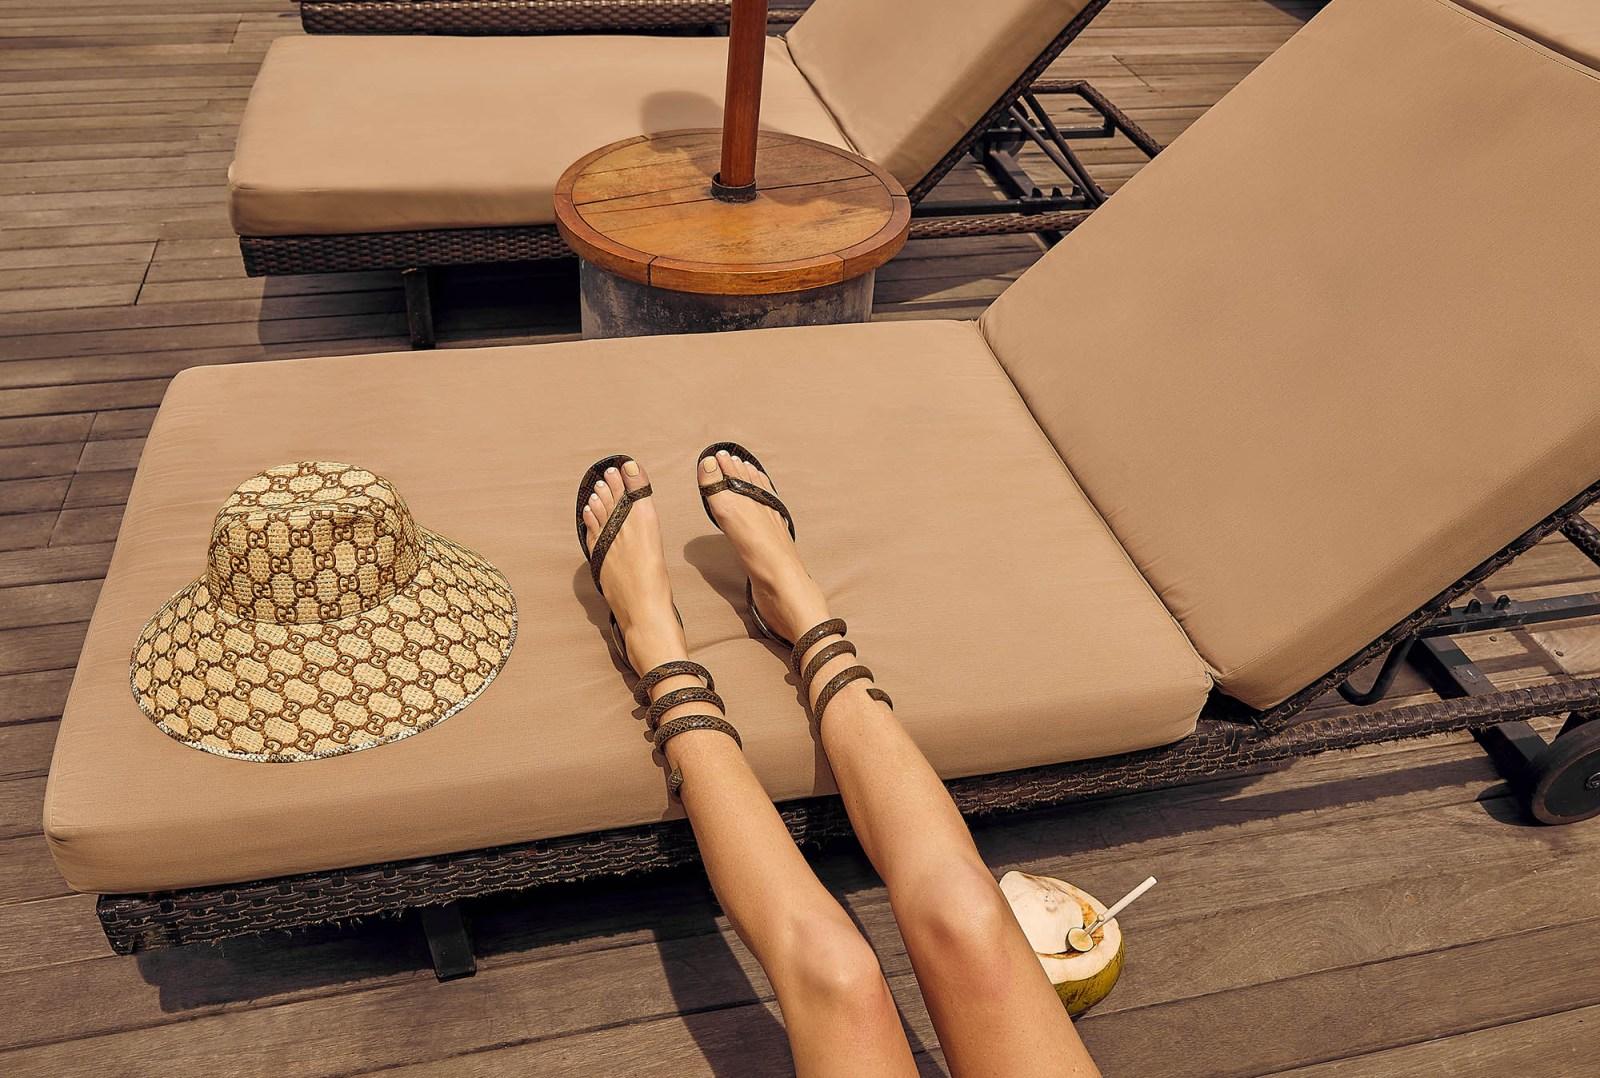 Gucci-Straw-Hat-Bottega-Veneta-Wrap-Sandals-Amanda-Shadforth.1